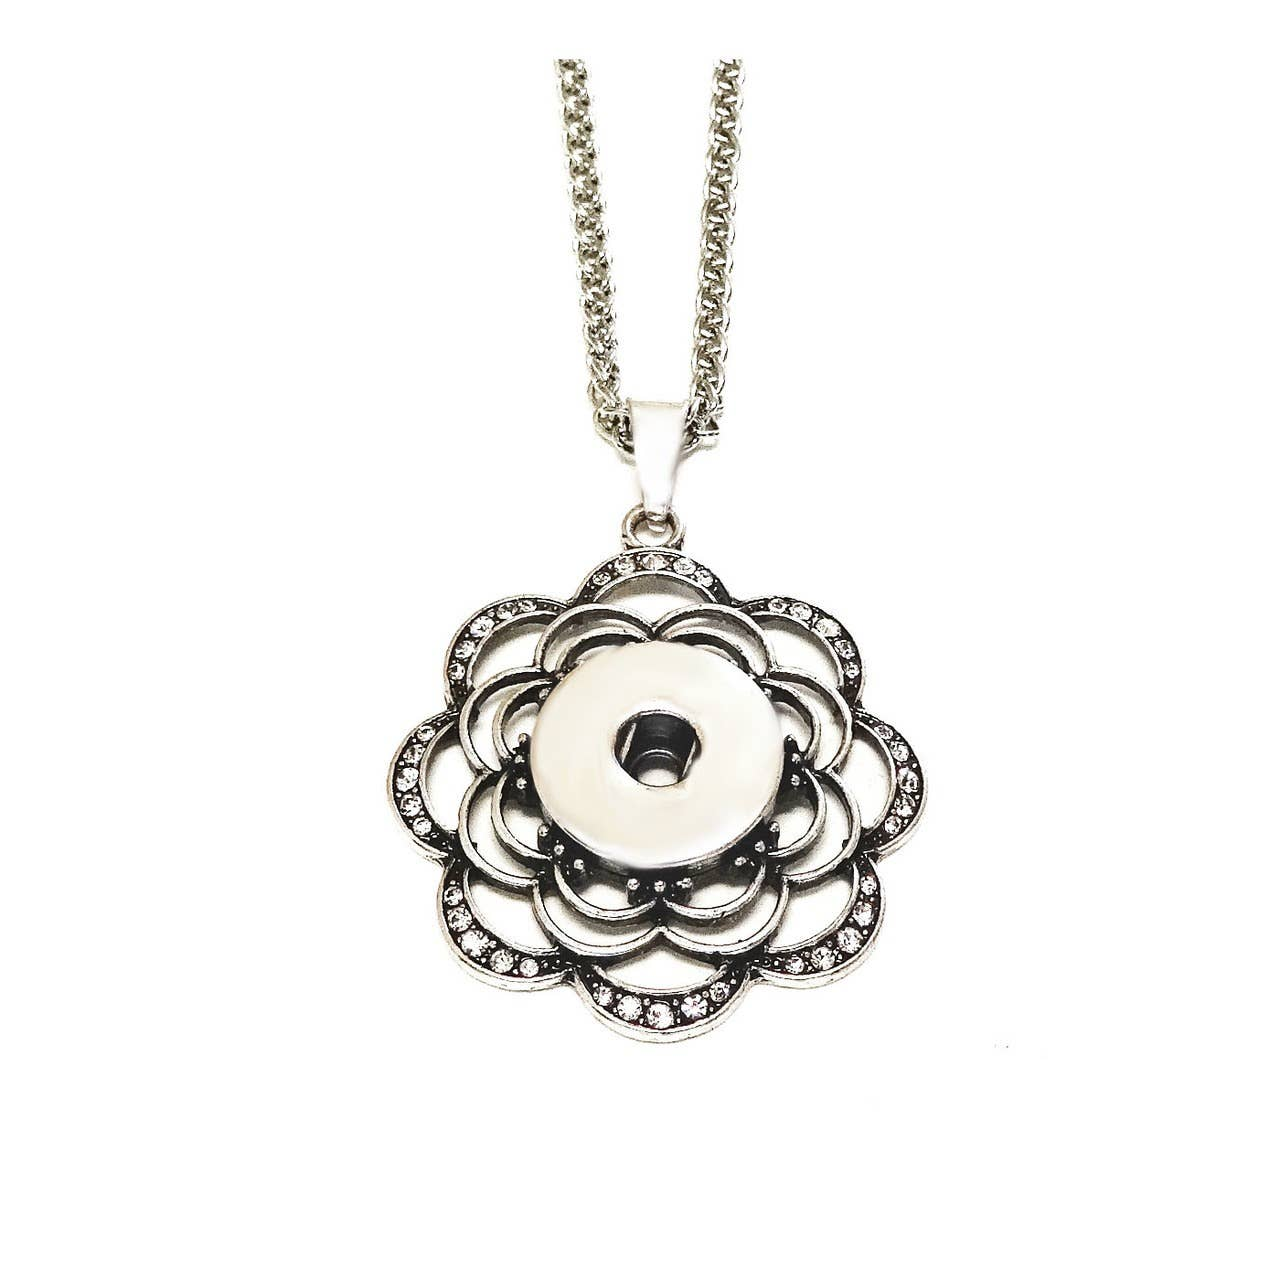 Many Swirls Snap Jewel Necklace | Trada Marketplace